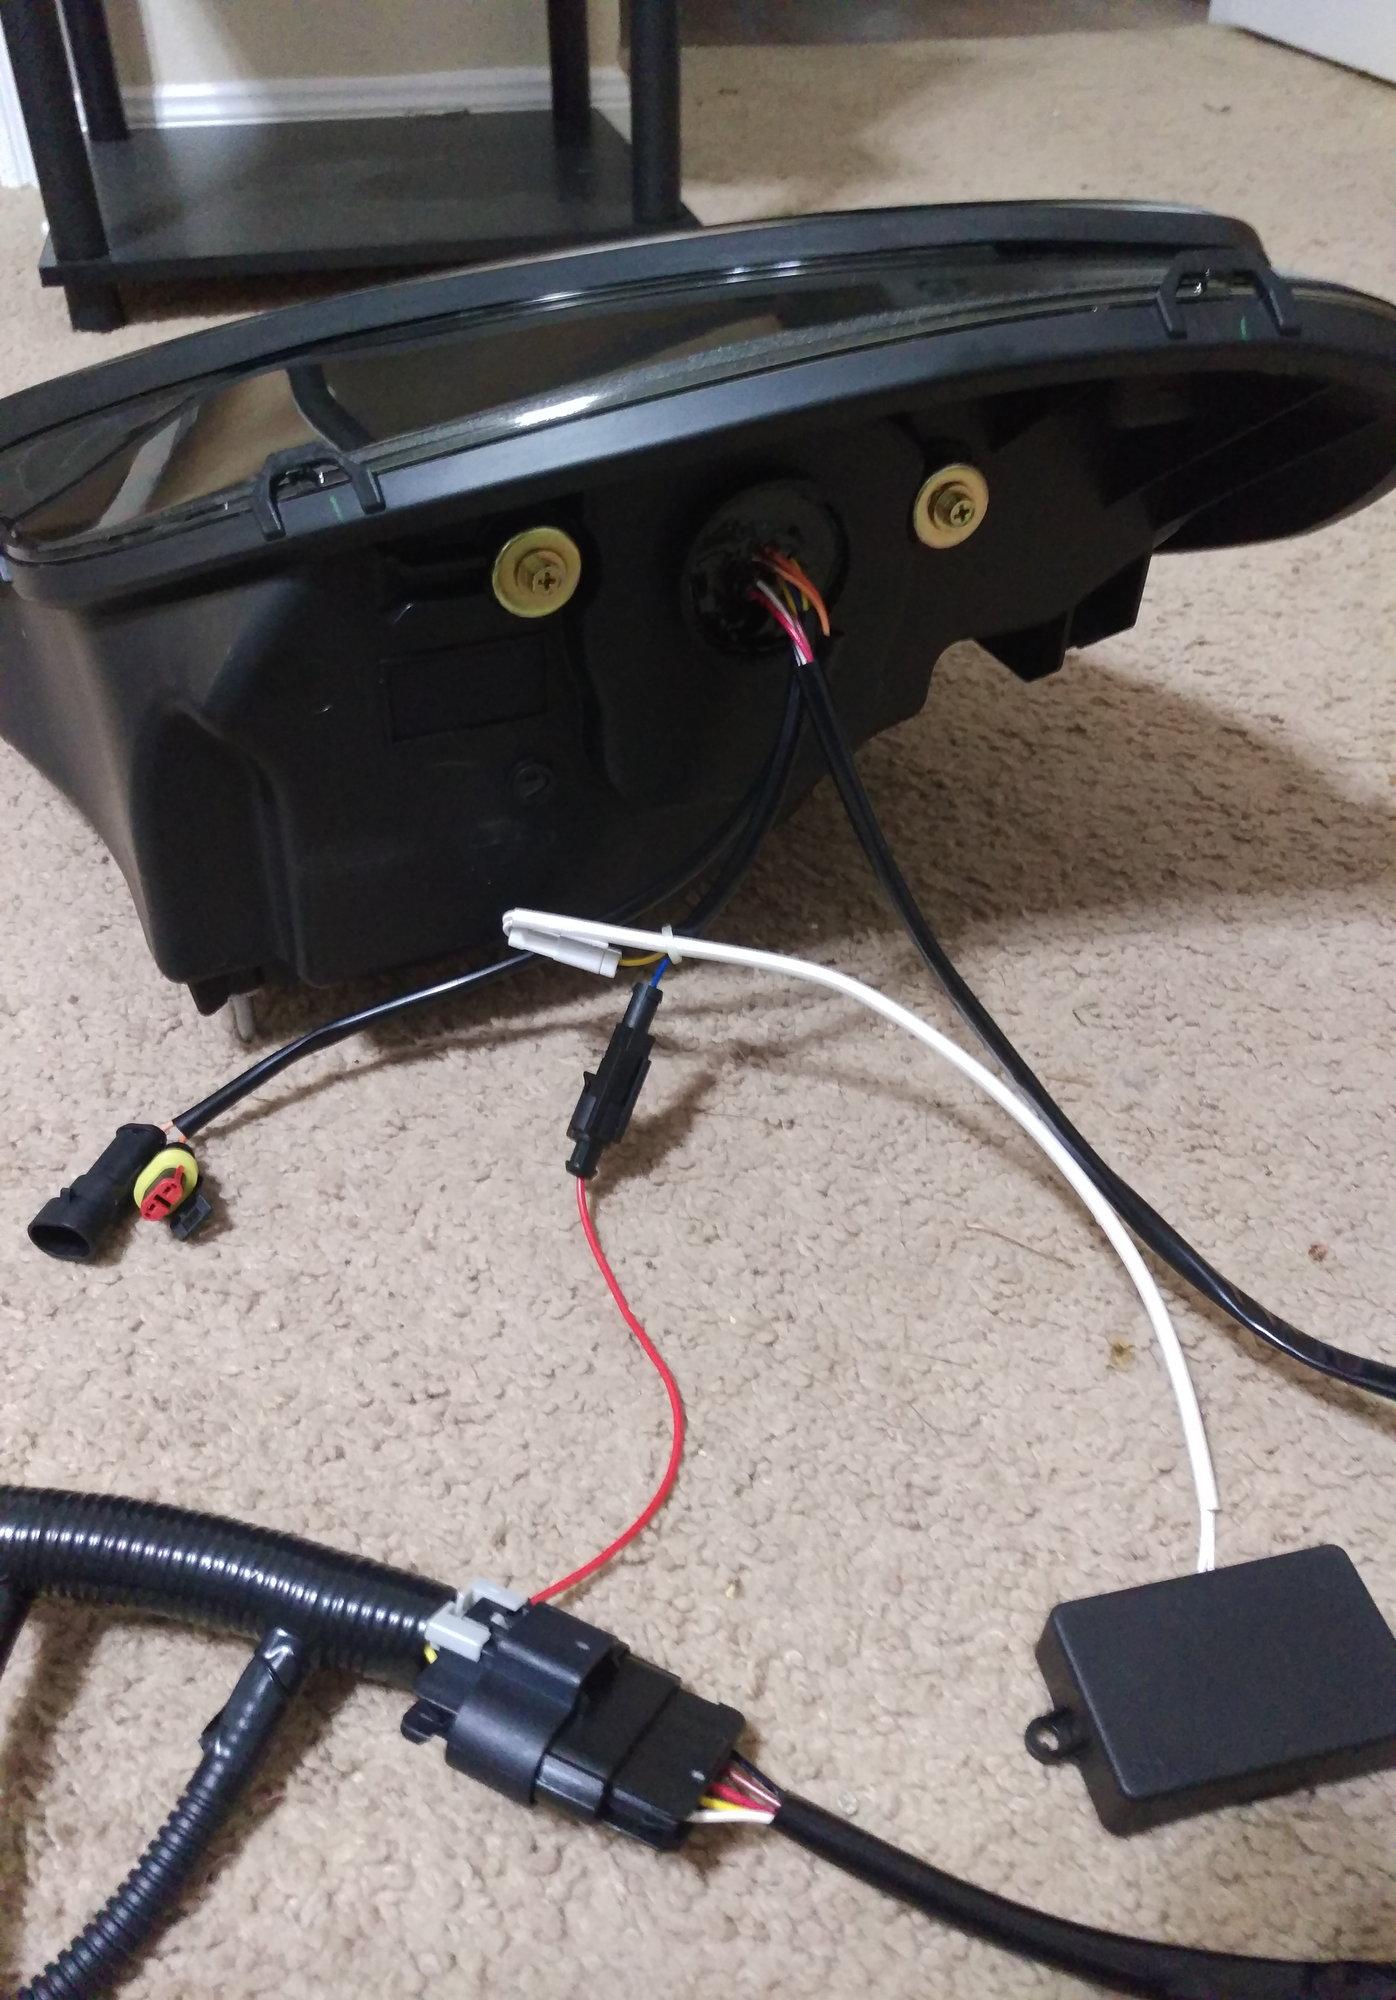 c6 bi led headlights with radioflyer harness testing. Black Bedroom Furniture Sets. Home Design Ideas